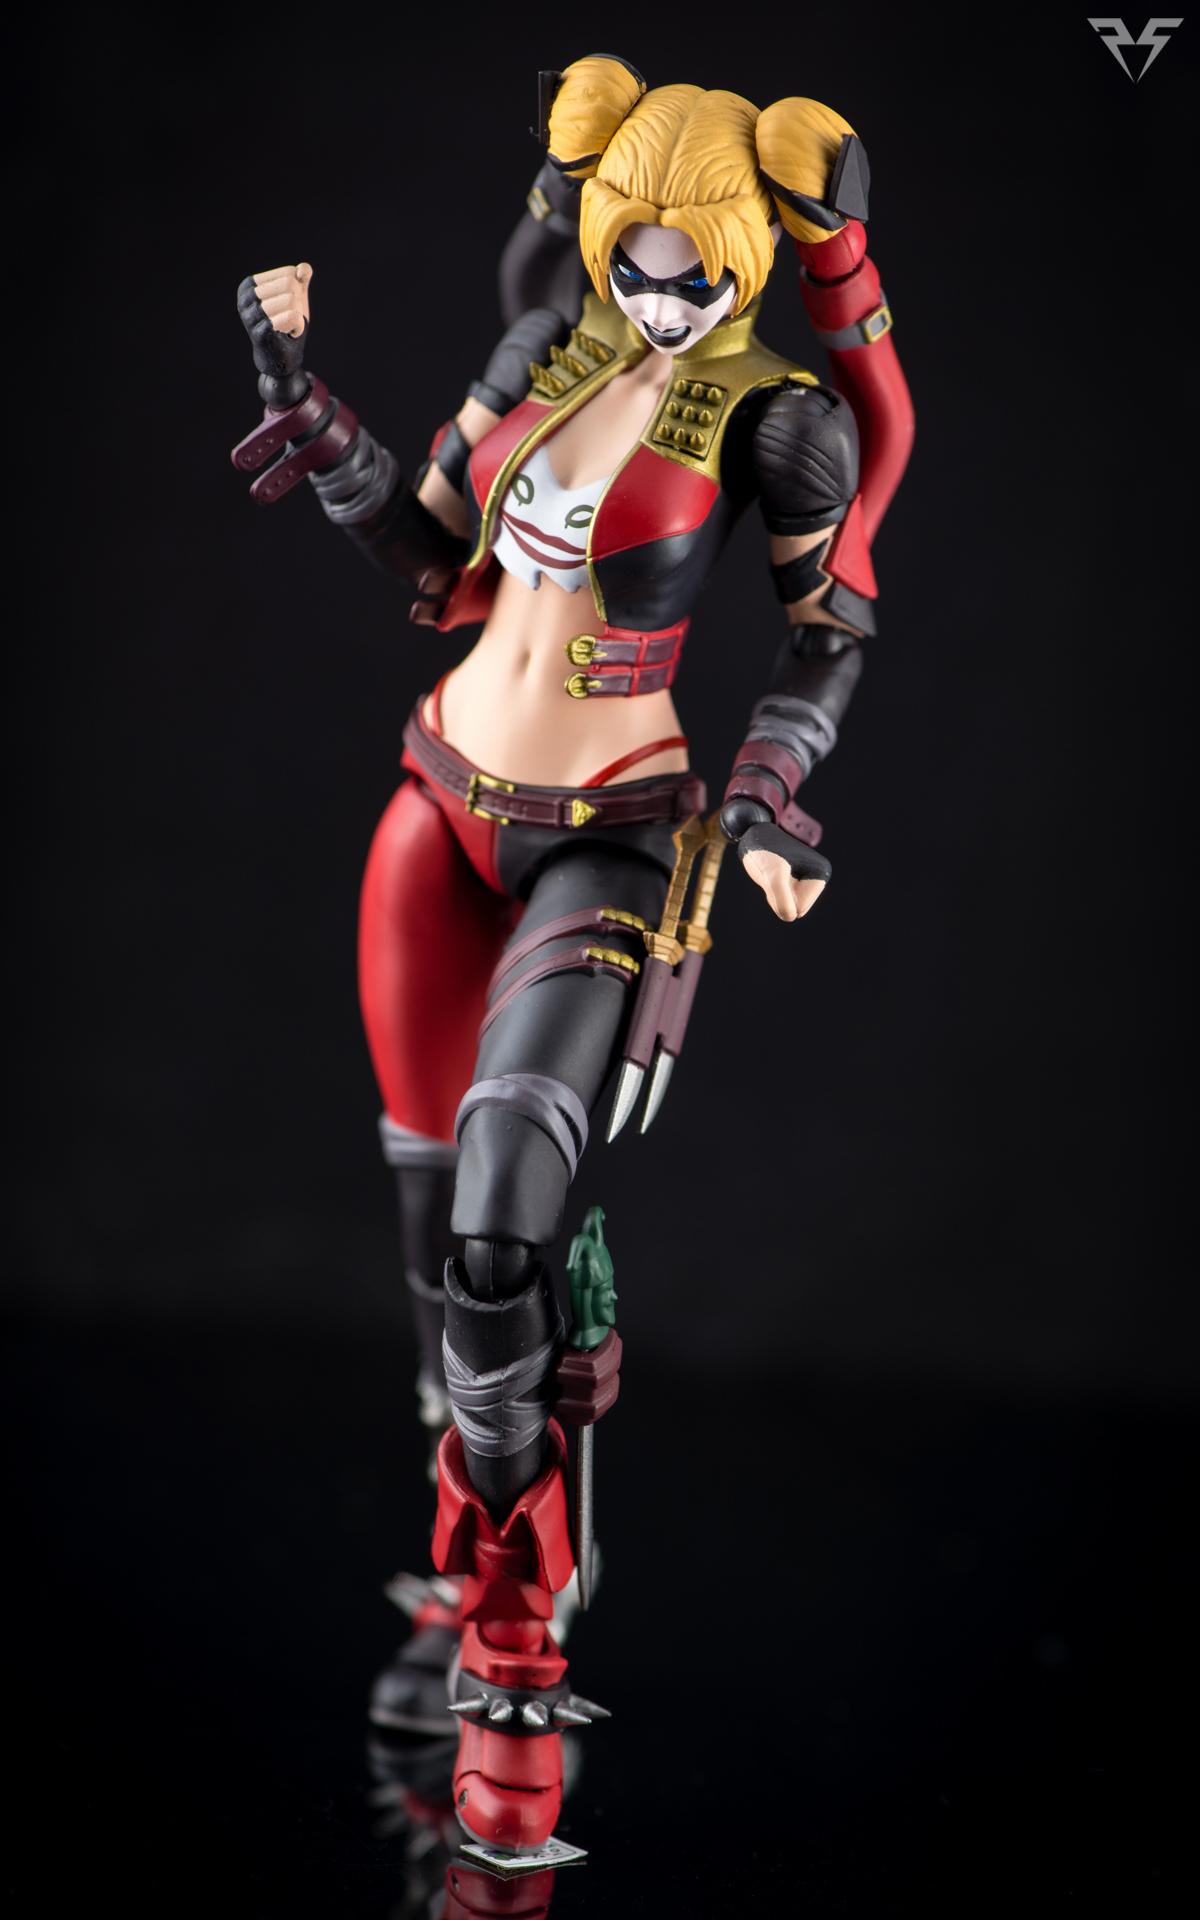 Figuarts Harley Quinn-11.jpg